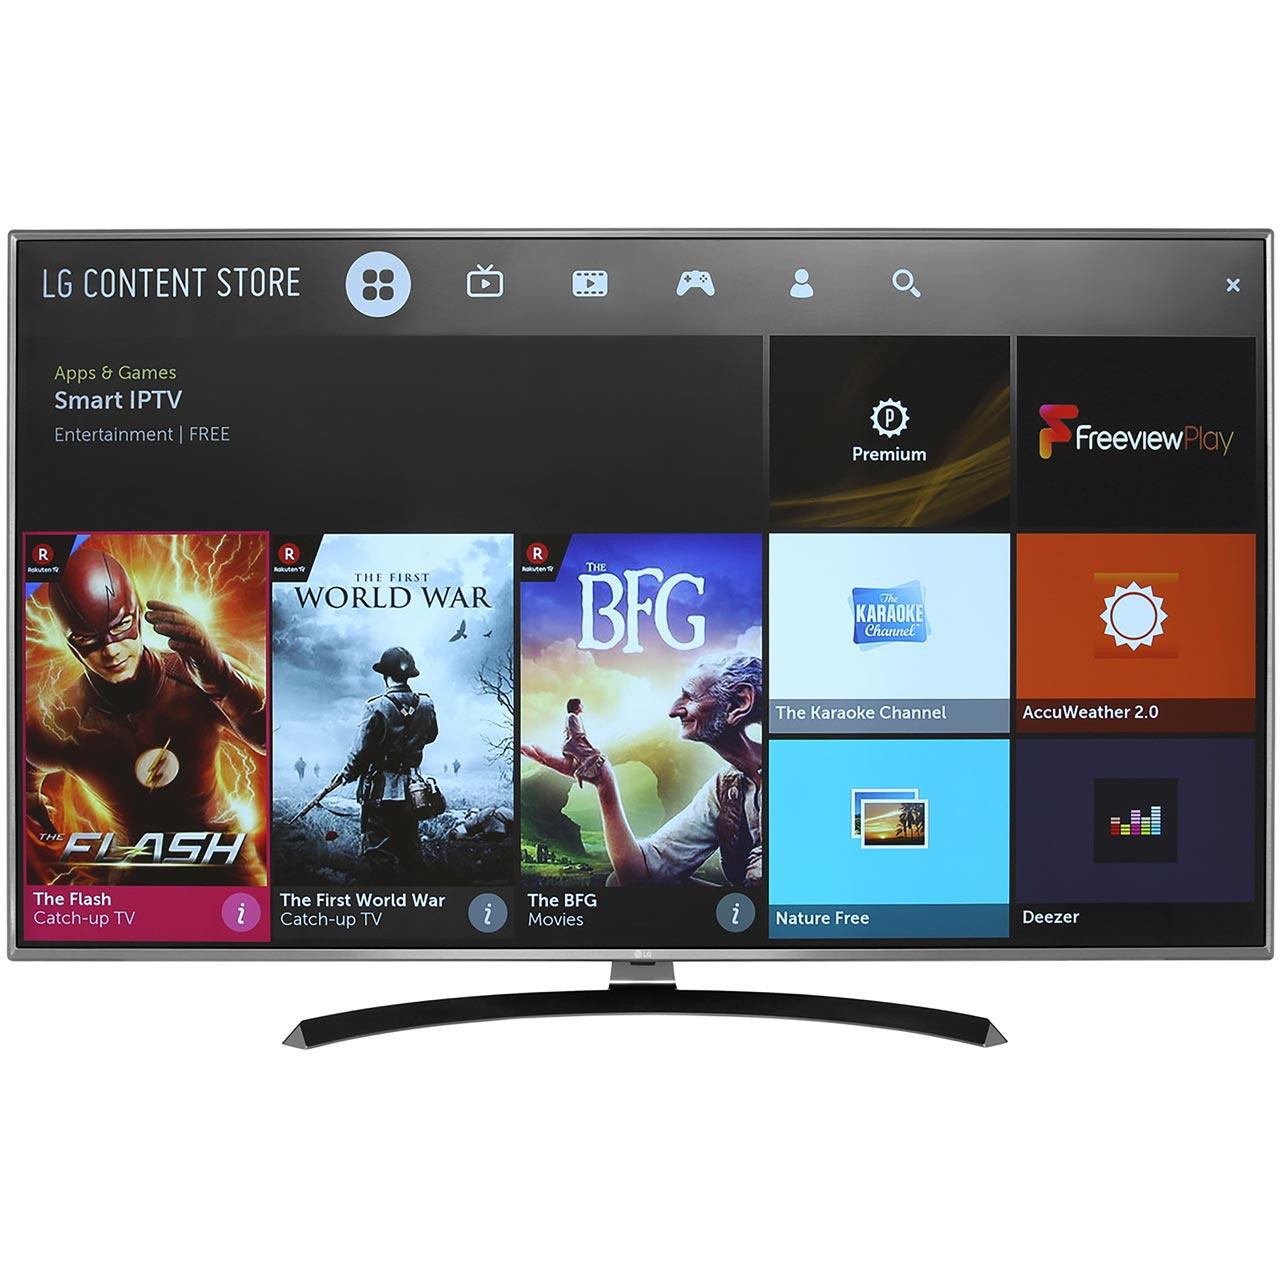 Lg Uhd Tv 4k 49 Price In India 55 Zoll Full Hd Gebraucht Outdoor Hdtv Antenna 100 Mile Range Hdtv Cable Uses: LG 49UJ670V UHD 49 Inch Smart LED TV 4K Ultra HD 4 HDMI